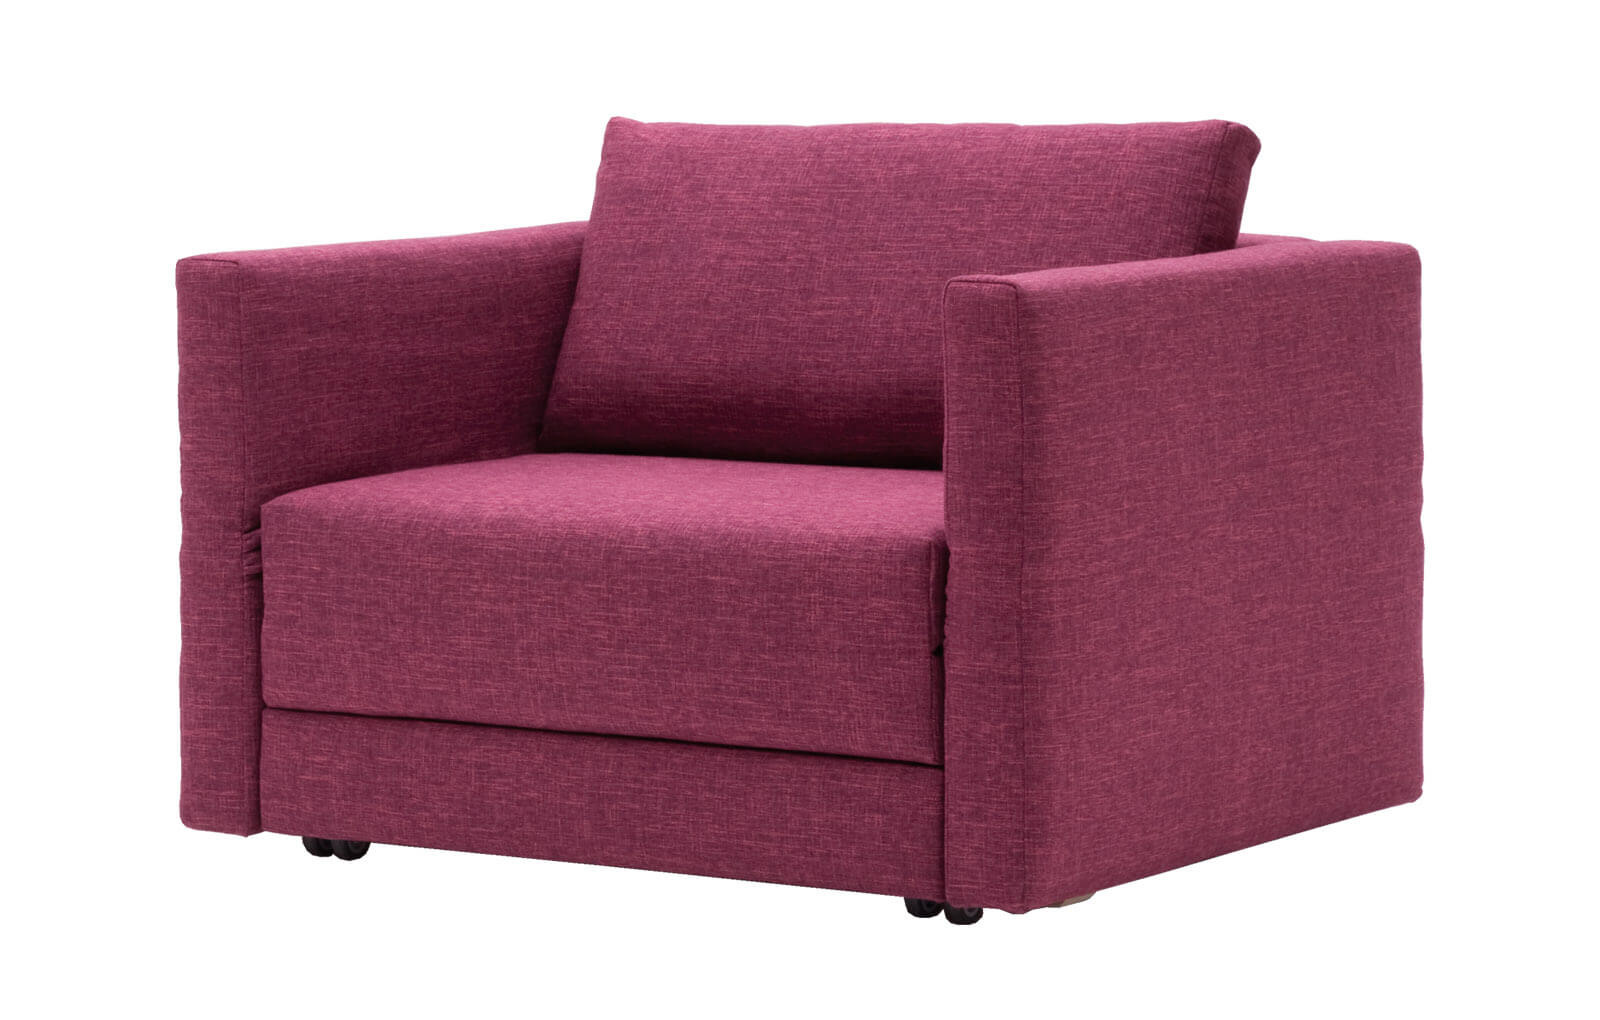 sessel zum schlafen williamflooring. Black Bedroom Furniture Sets. Home Design Ideas